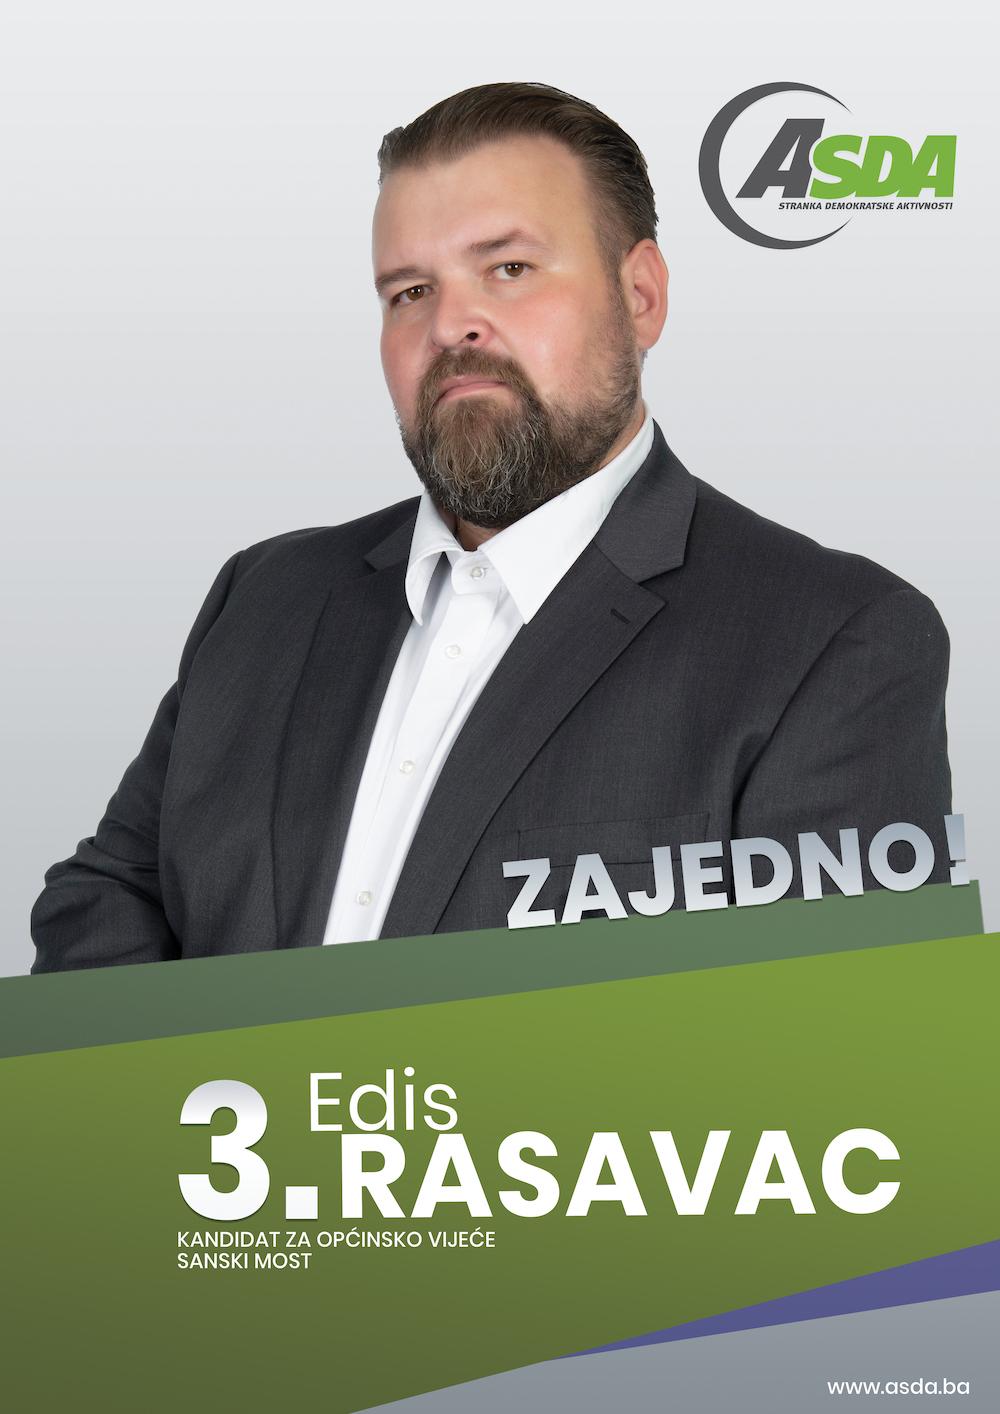 Edis Rasavac